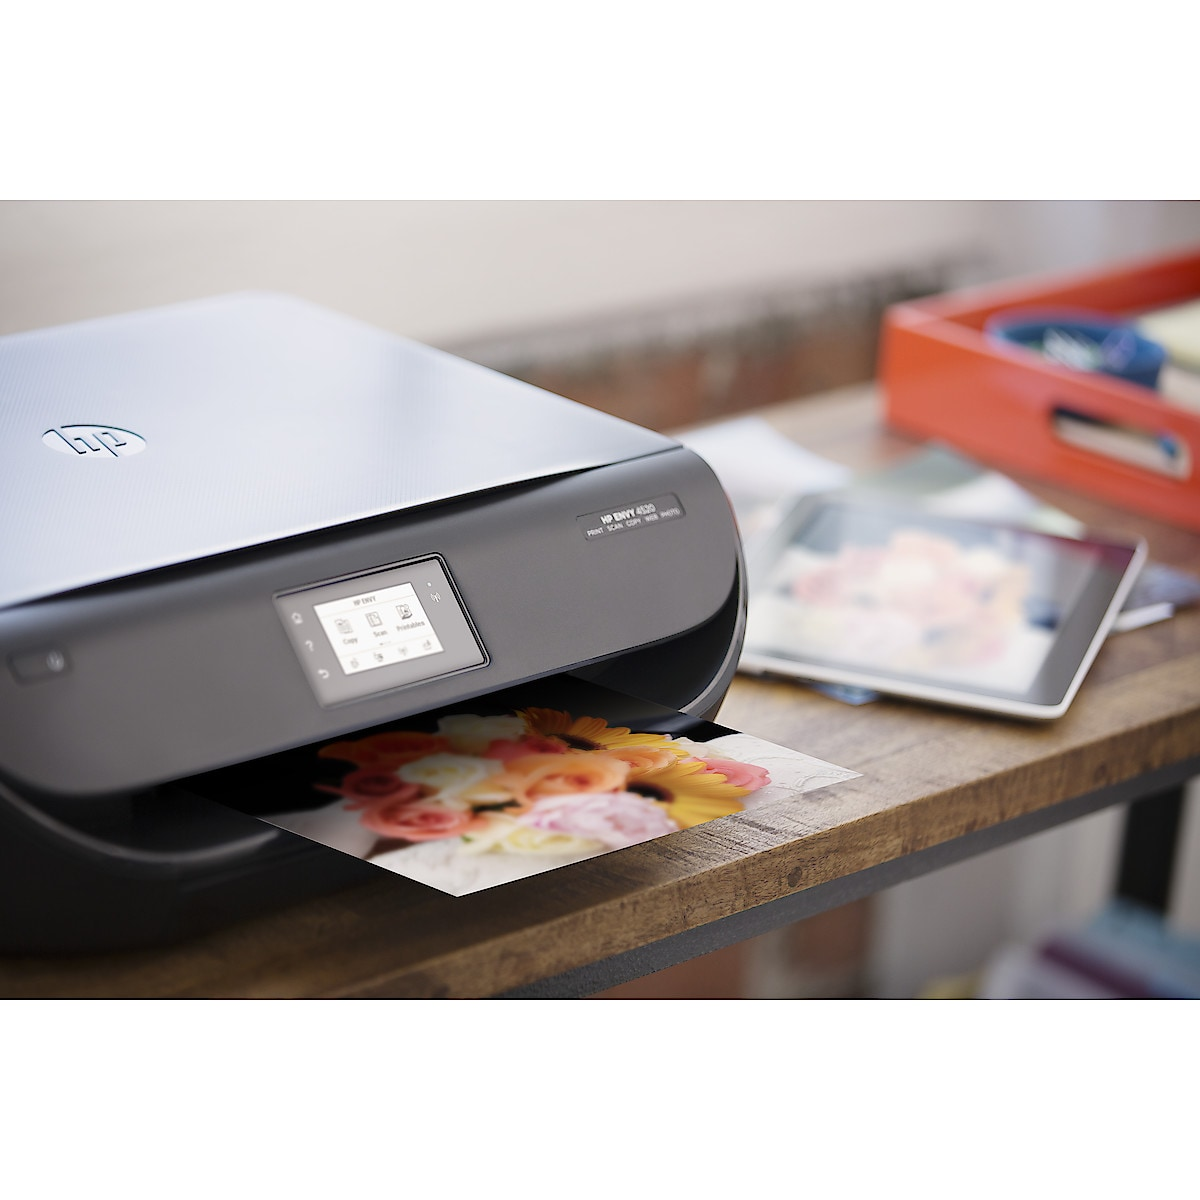 HP Envy 4520 AiO Inkjet Printer